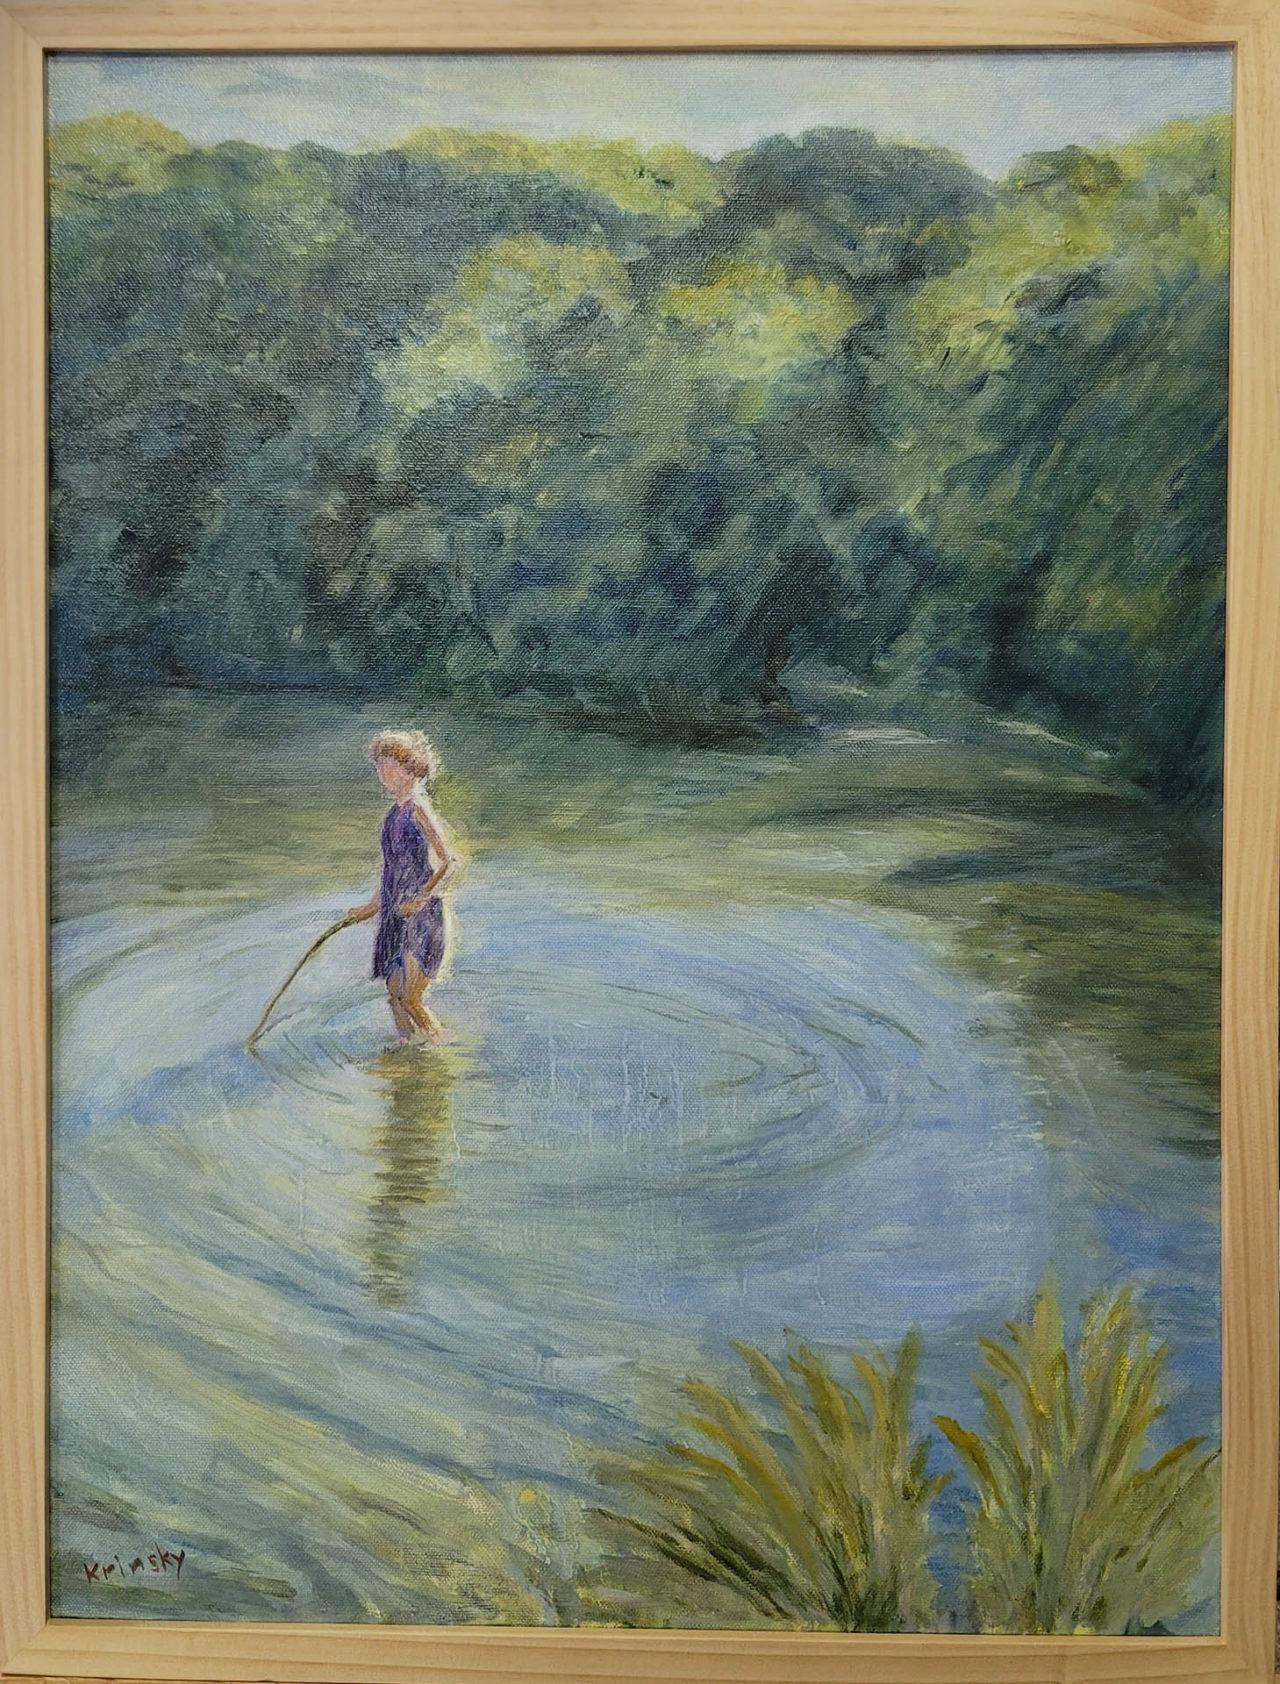 Mt. Nebo Pond - Maureen Krinsky